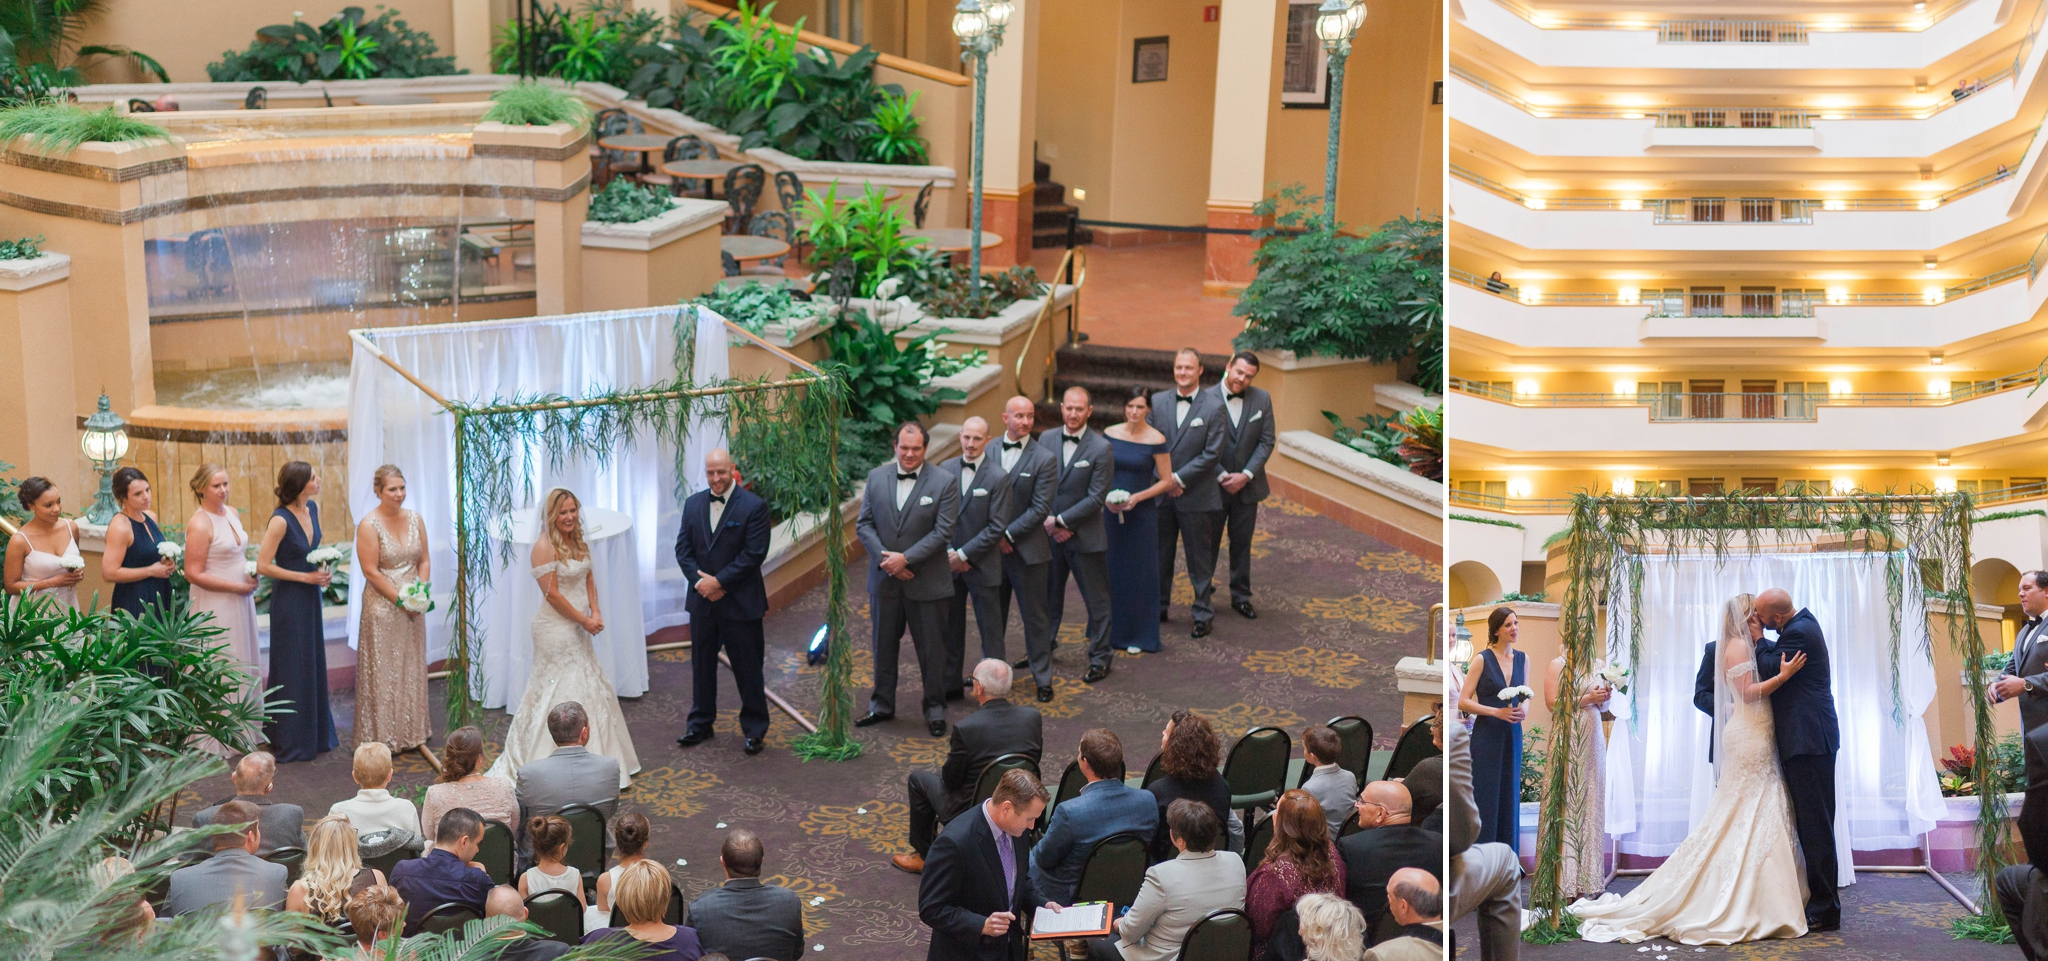 Rachel + Justin - Wedding Photography in Greensboro, North ...